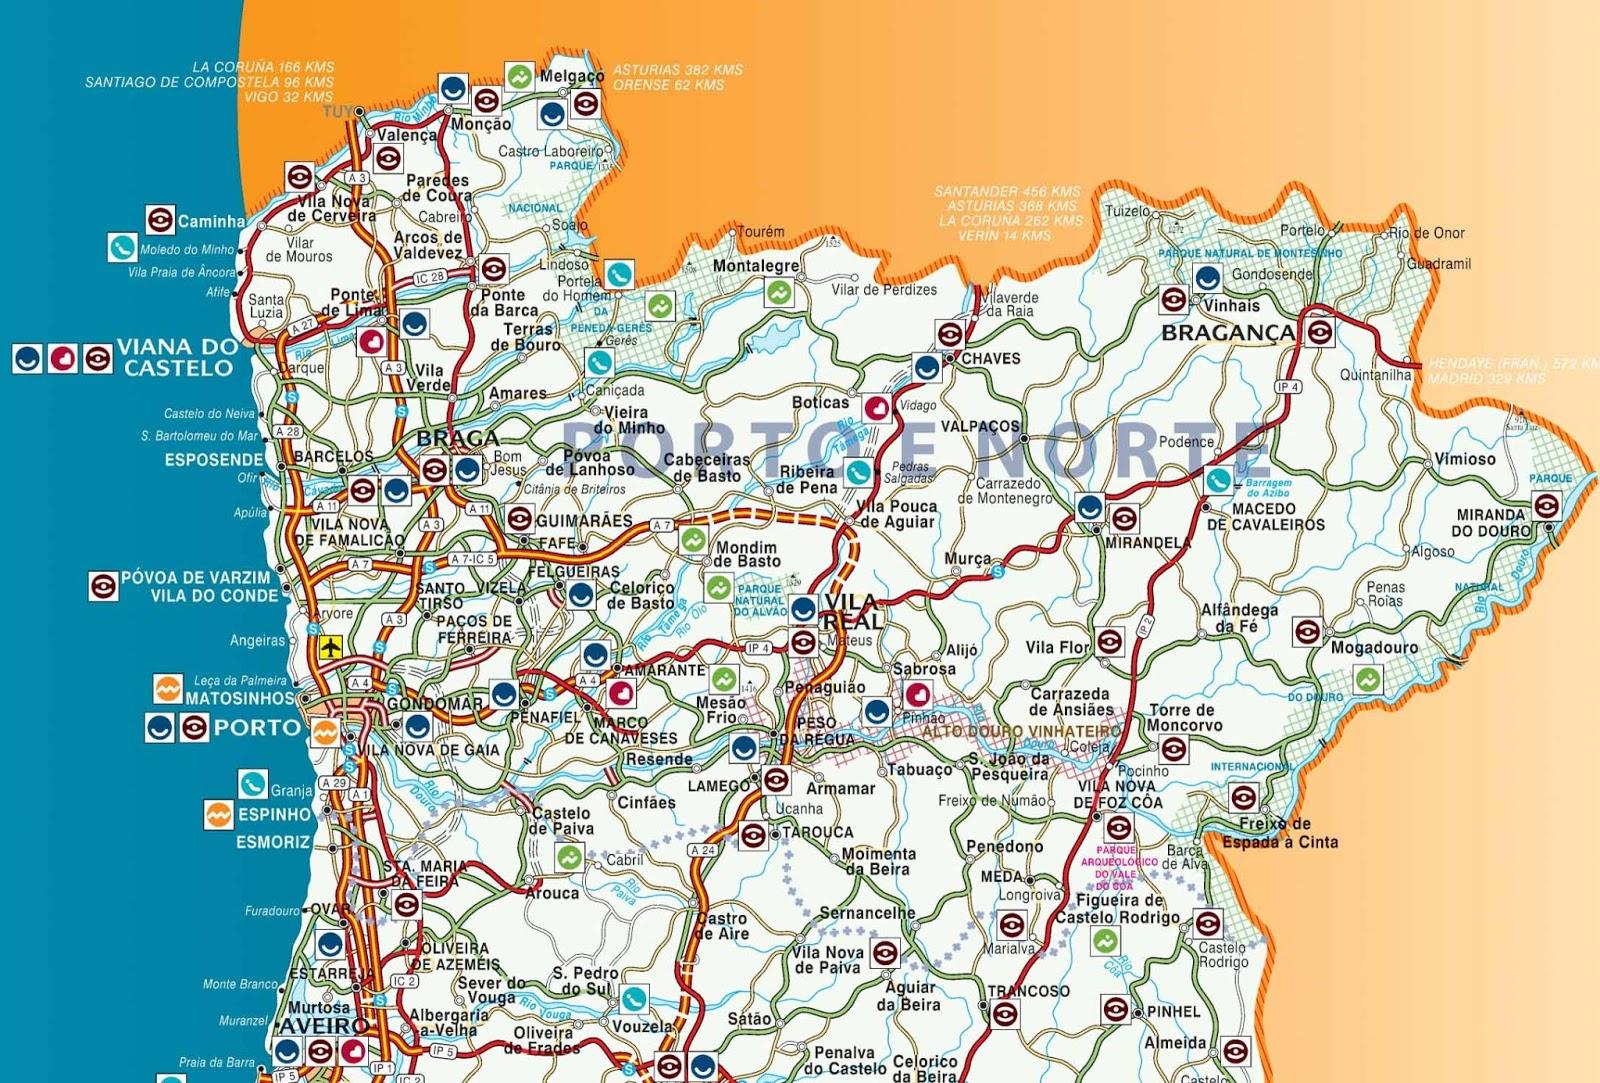 aeroportos espanha mapa Mapas de Braga   Portugal | MapasBlog aeroportos espanha mapa